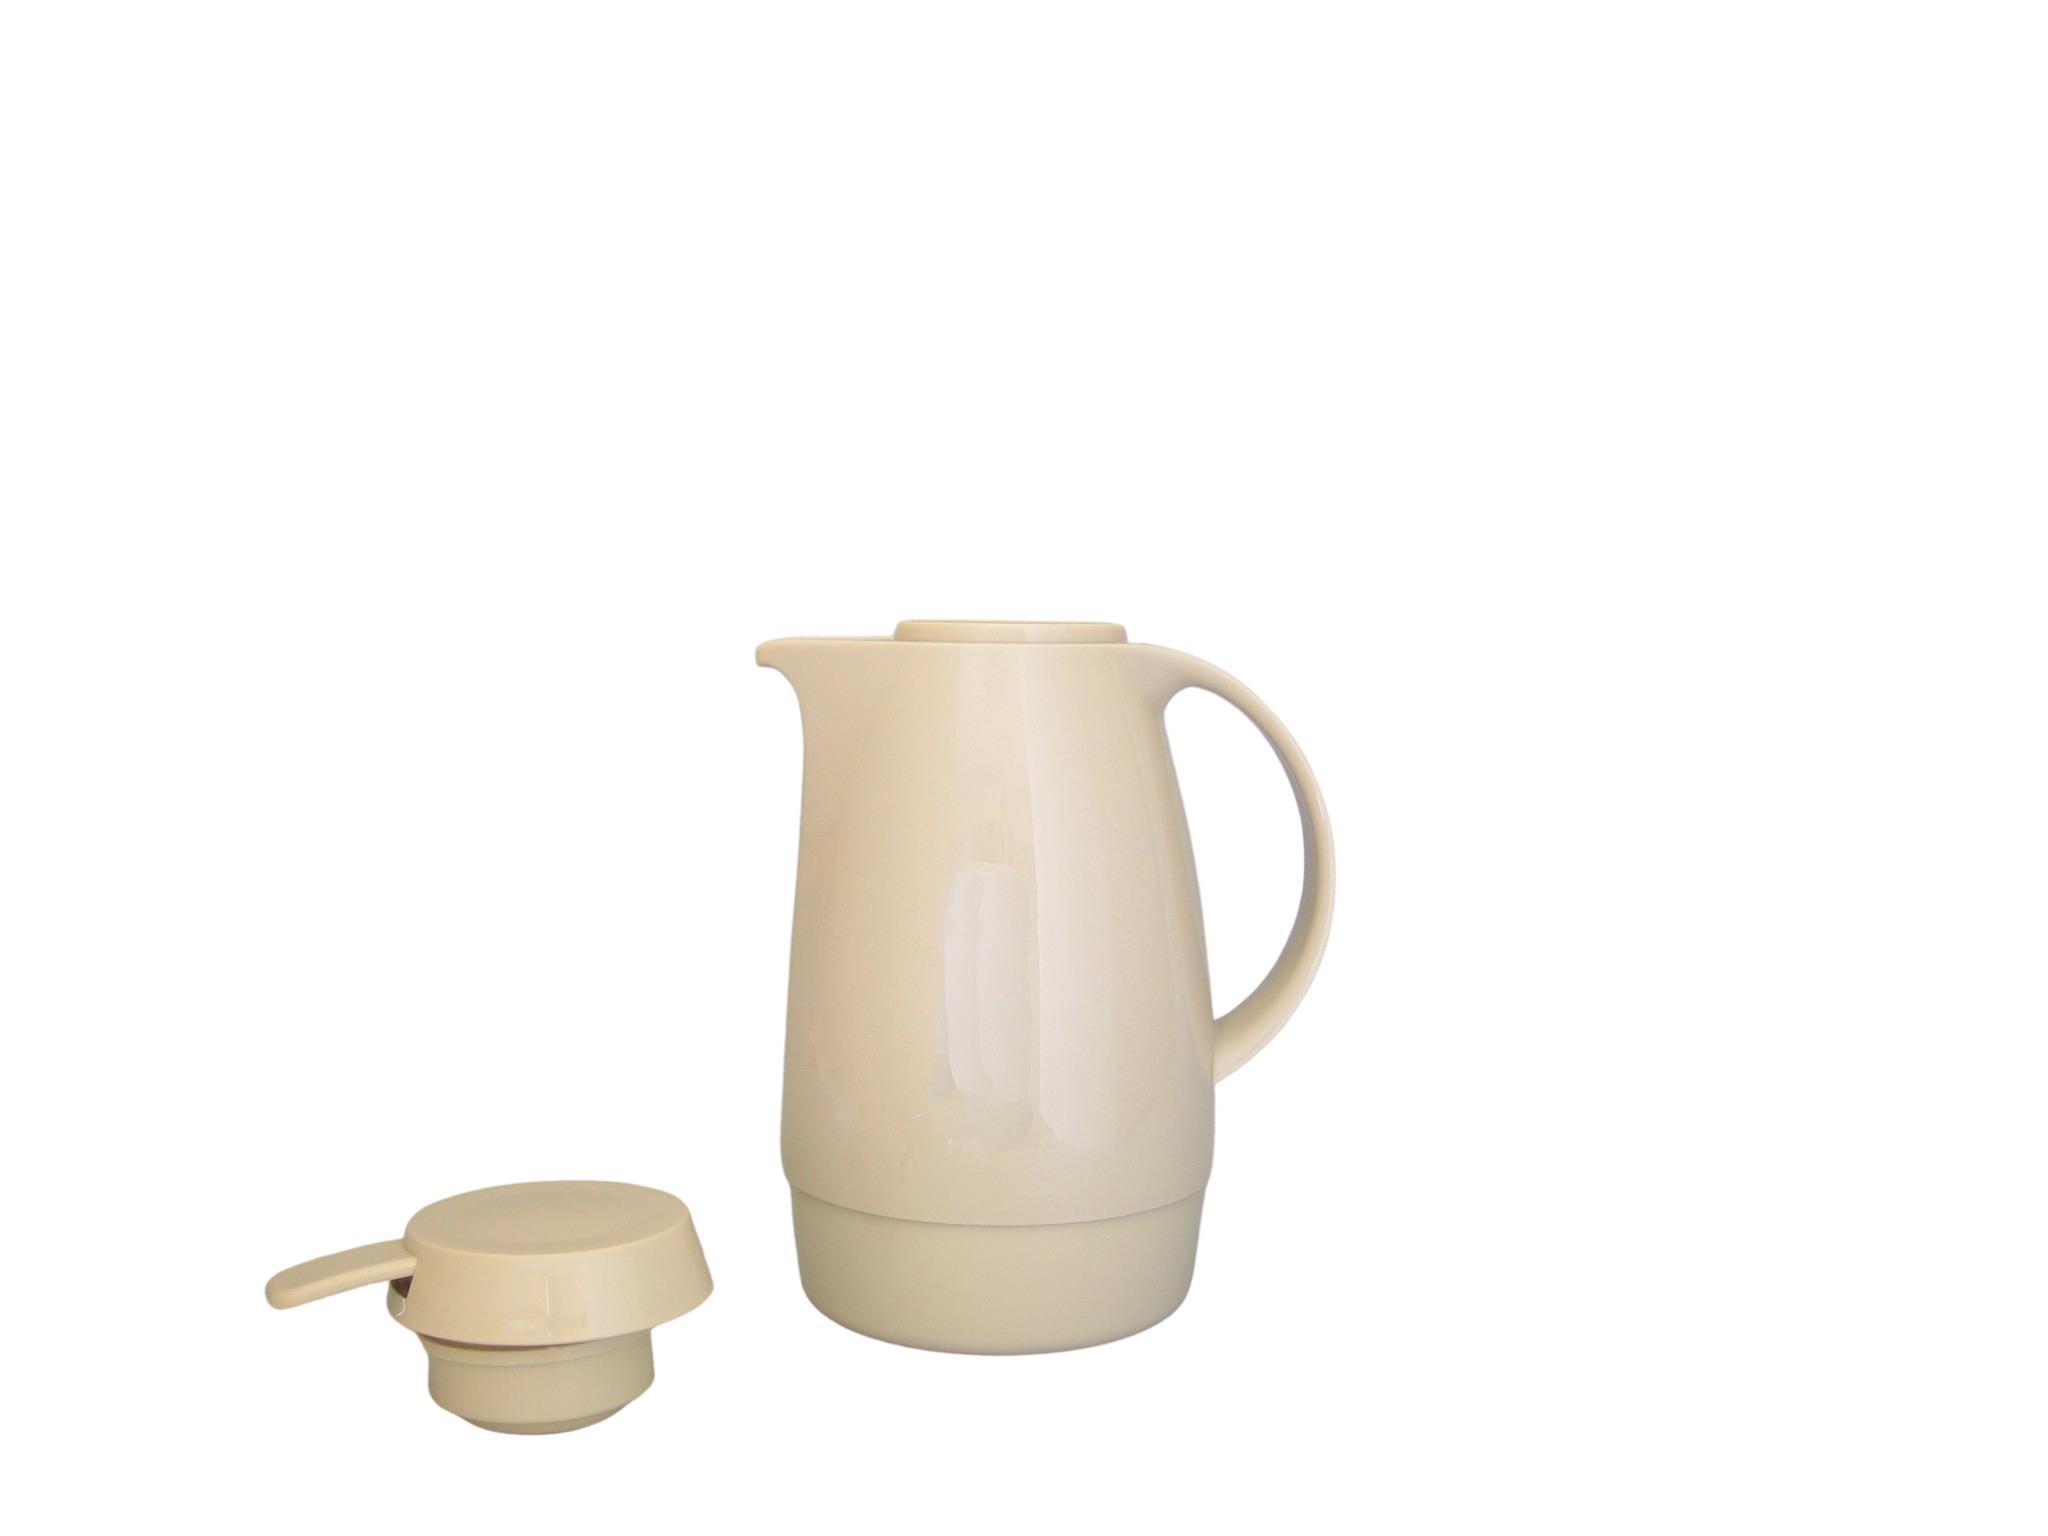 7202-042 - Vacuum carafe beige 0.60 L SERVITHERM - Helios